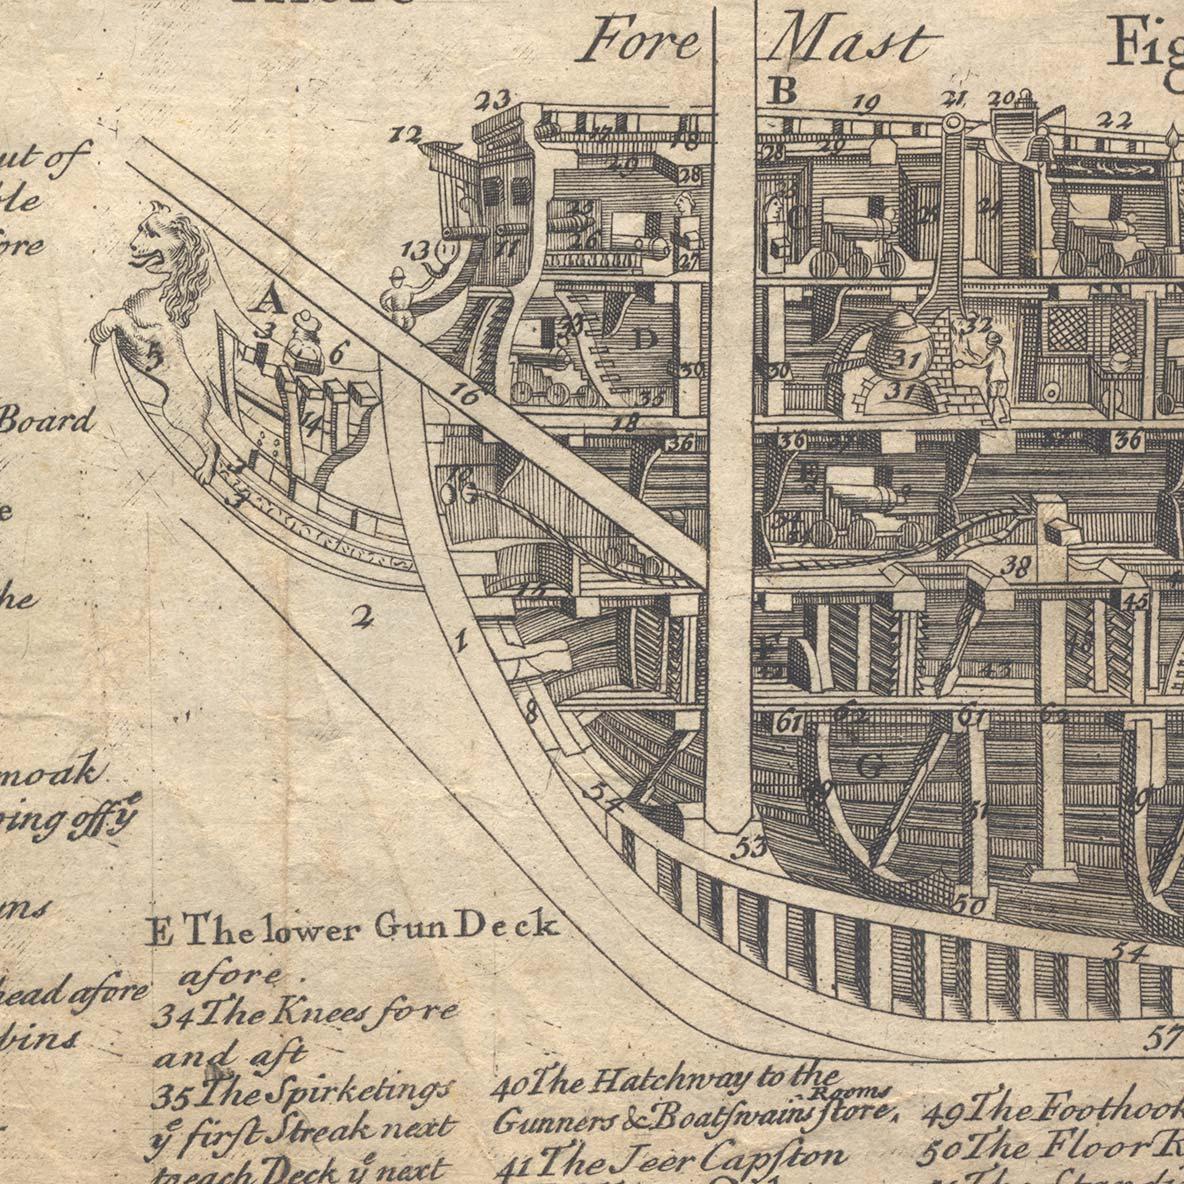 Incredible 1700s warship cutaway